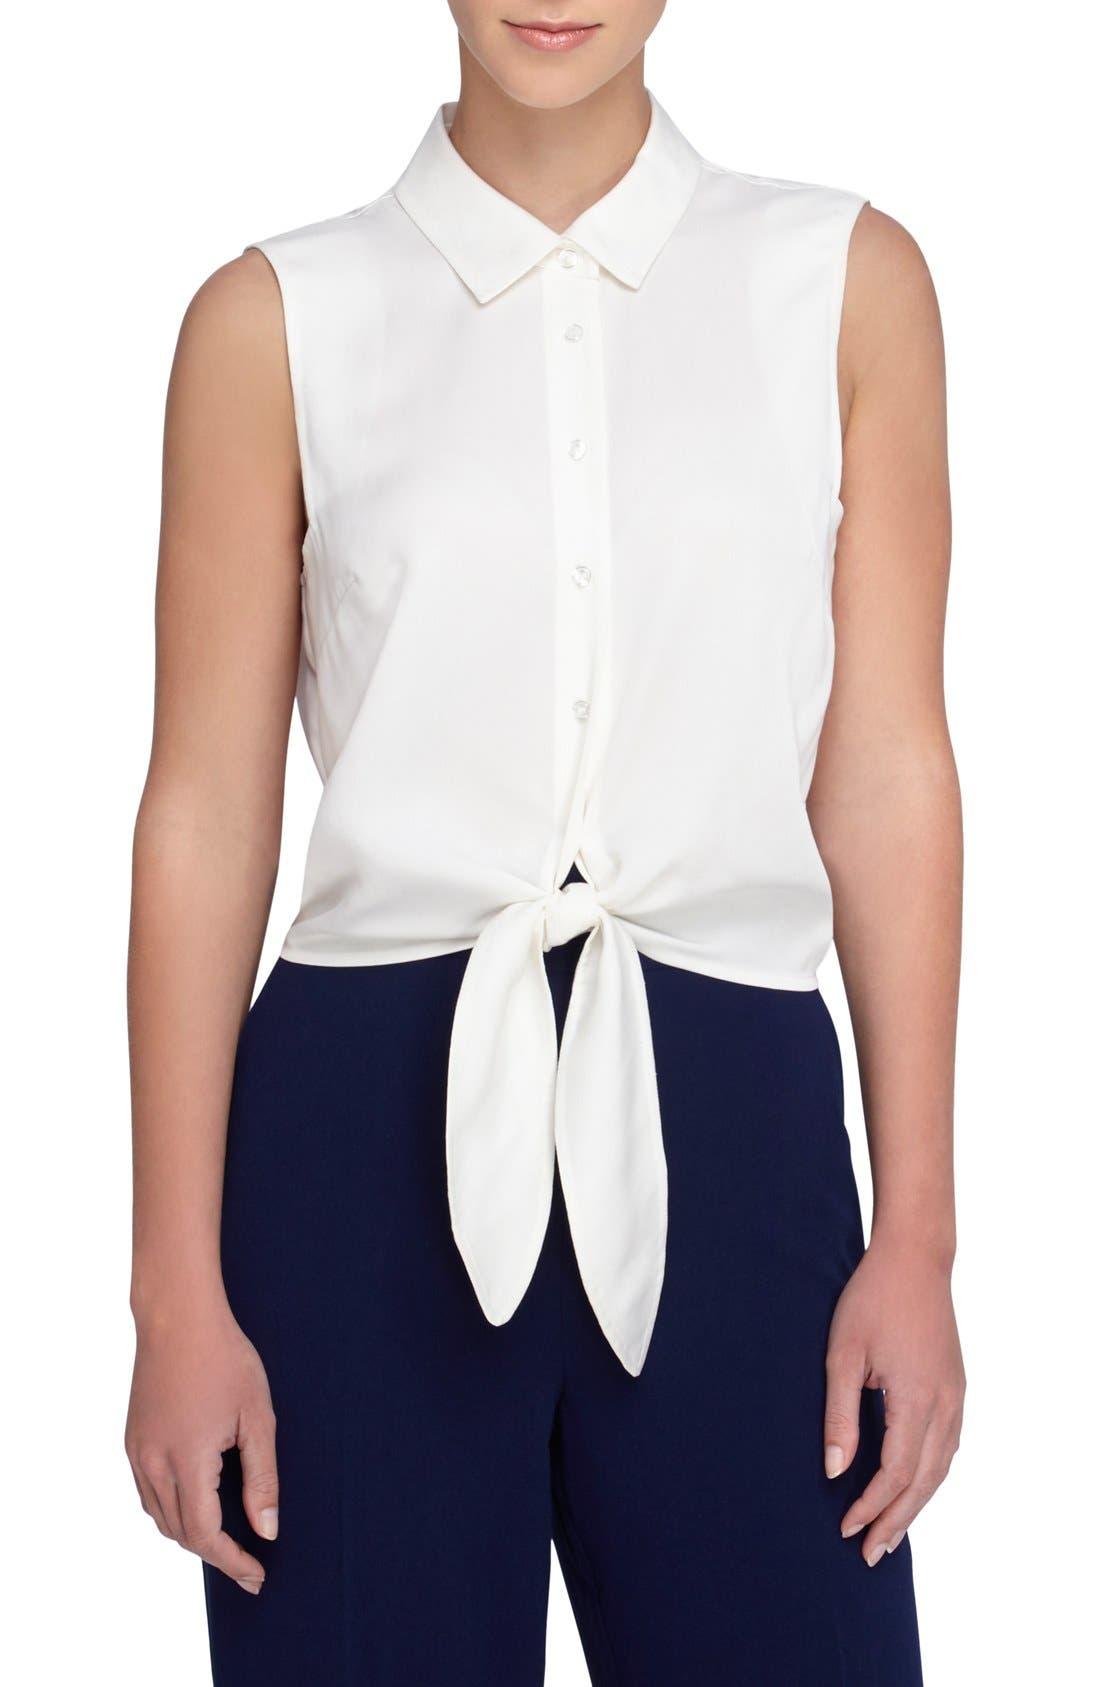 Alternate Image 1 Selected - Catherine Catherine Malandrino 'Colby' Sleeveless Tie Waist Blouse